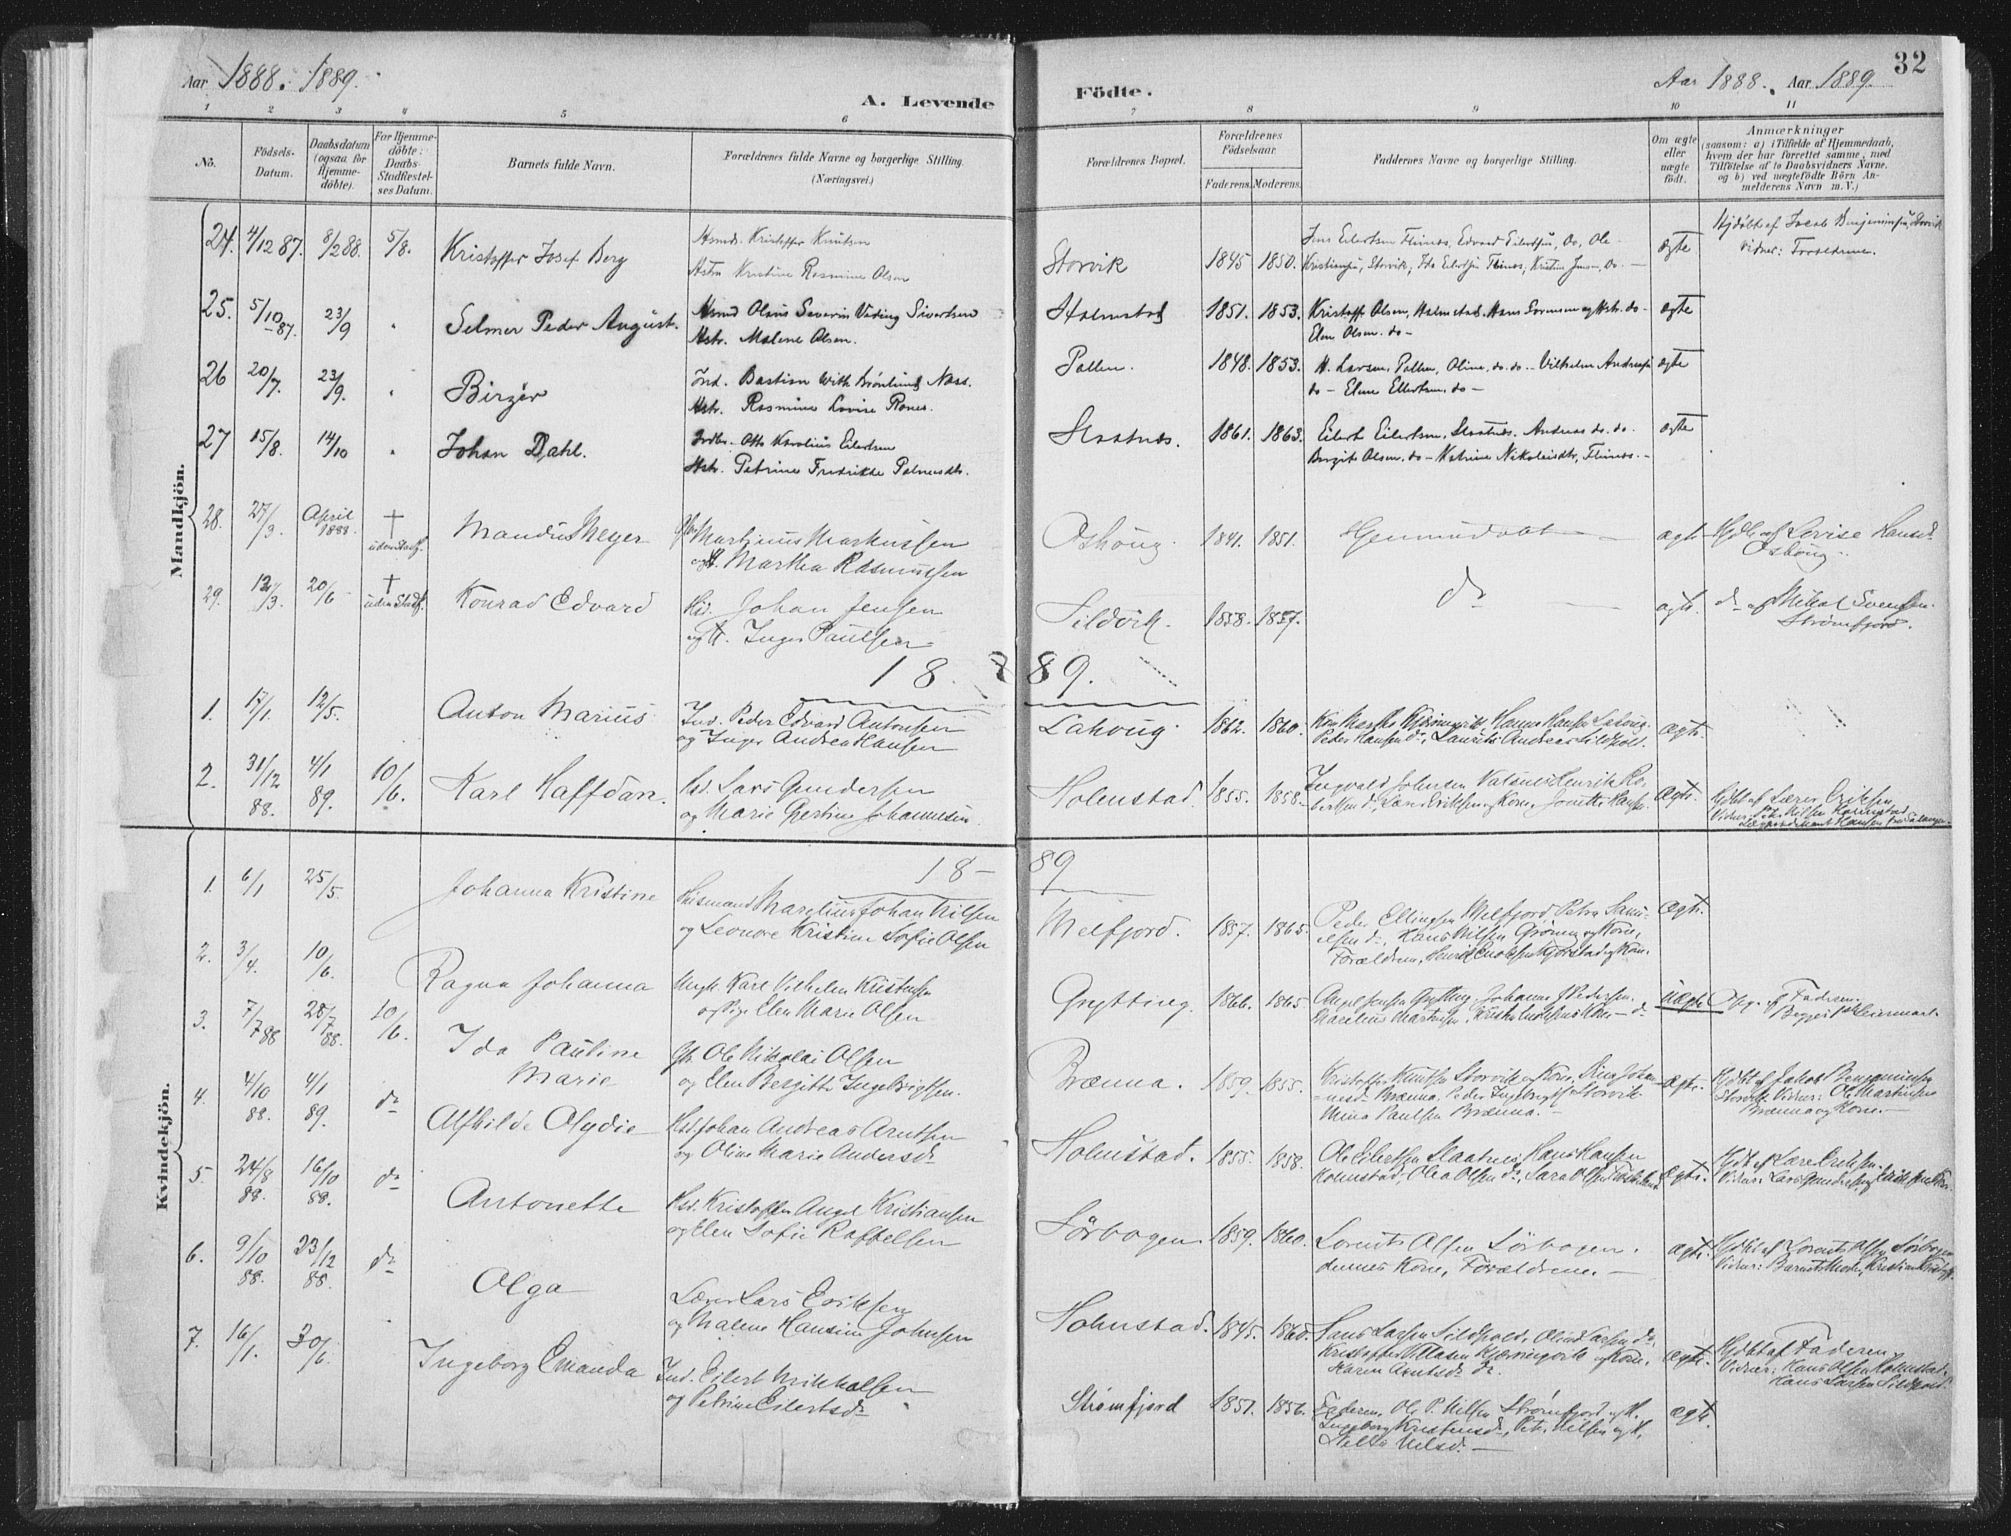 SAT, Ministerialprotokoller, klokkerbøker og fødselsregistre - Nordland, 890/L1286: Ministerialbok nr. 890A01, 1882-1902, s. 32